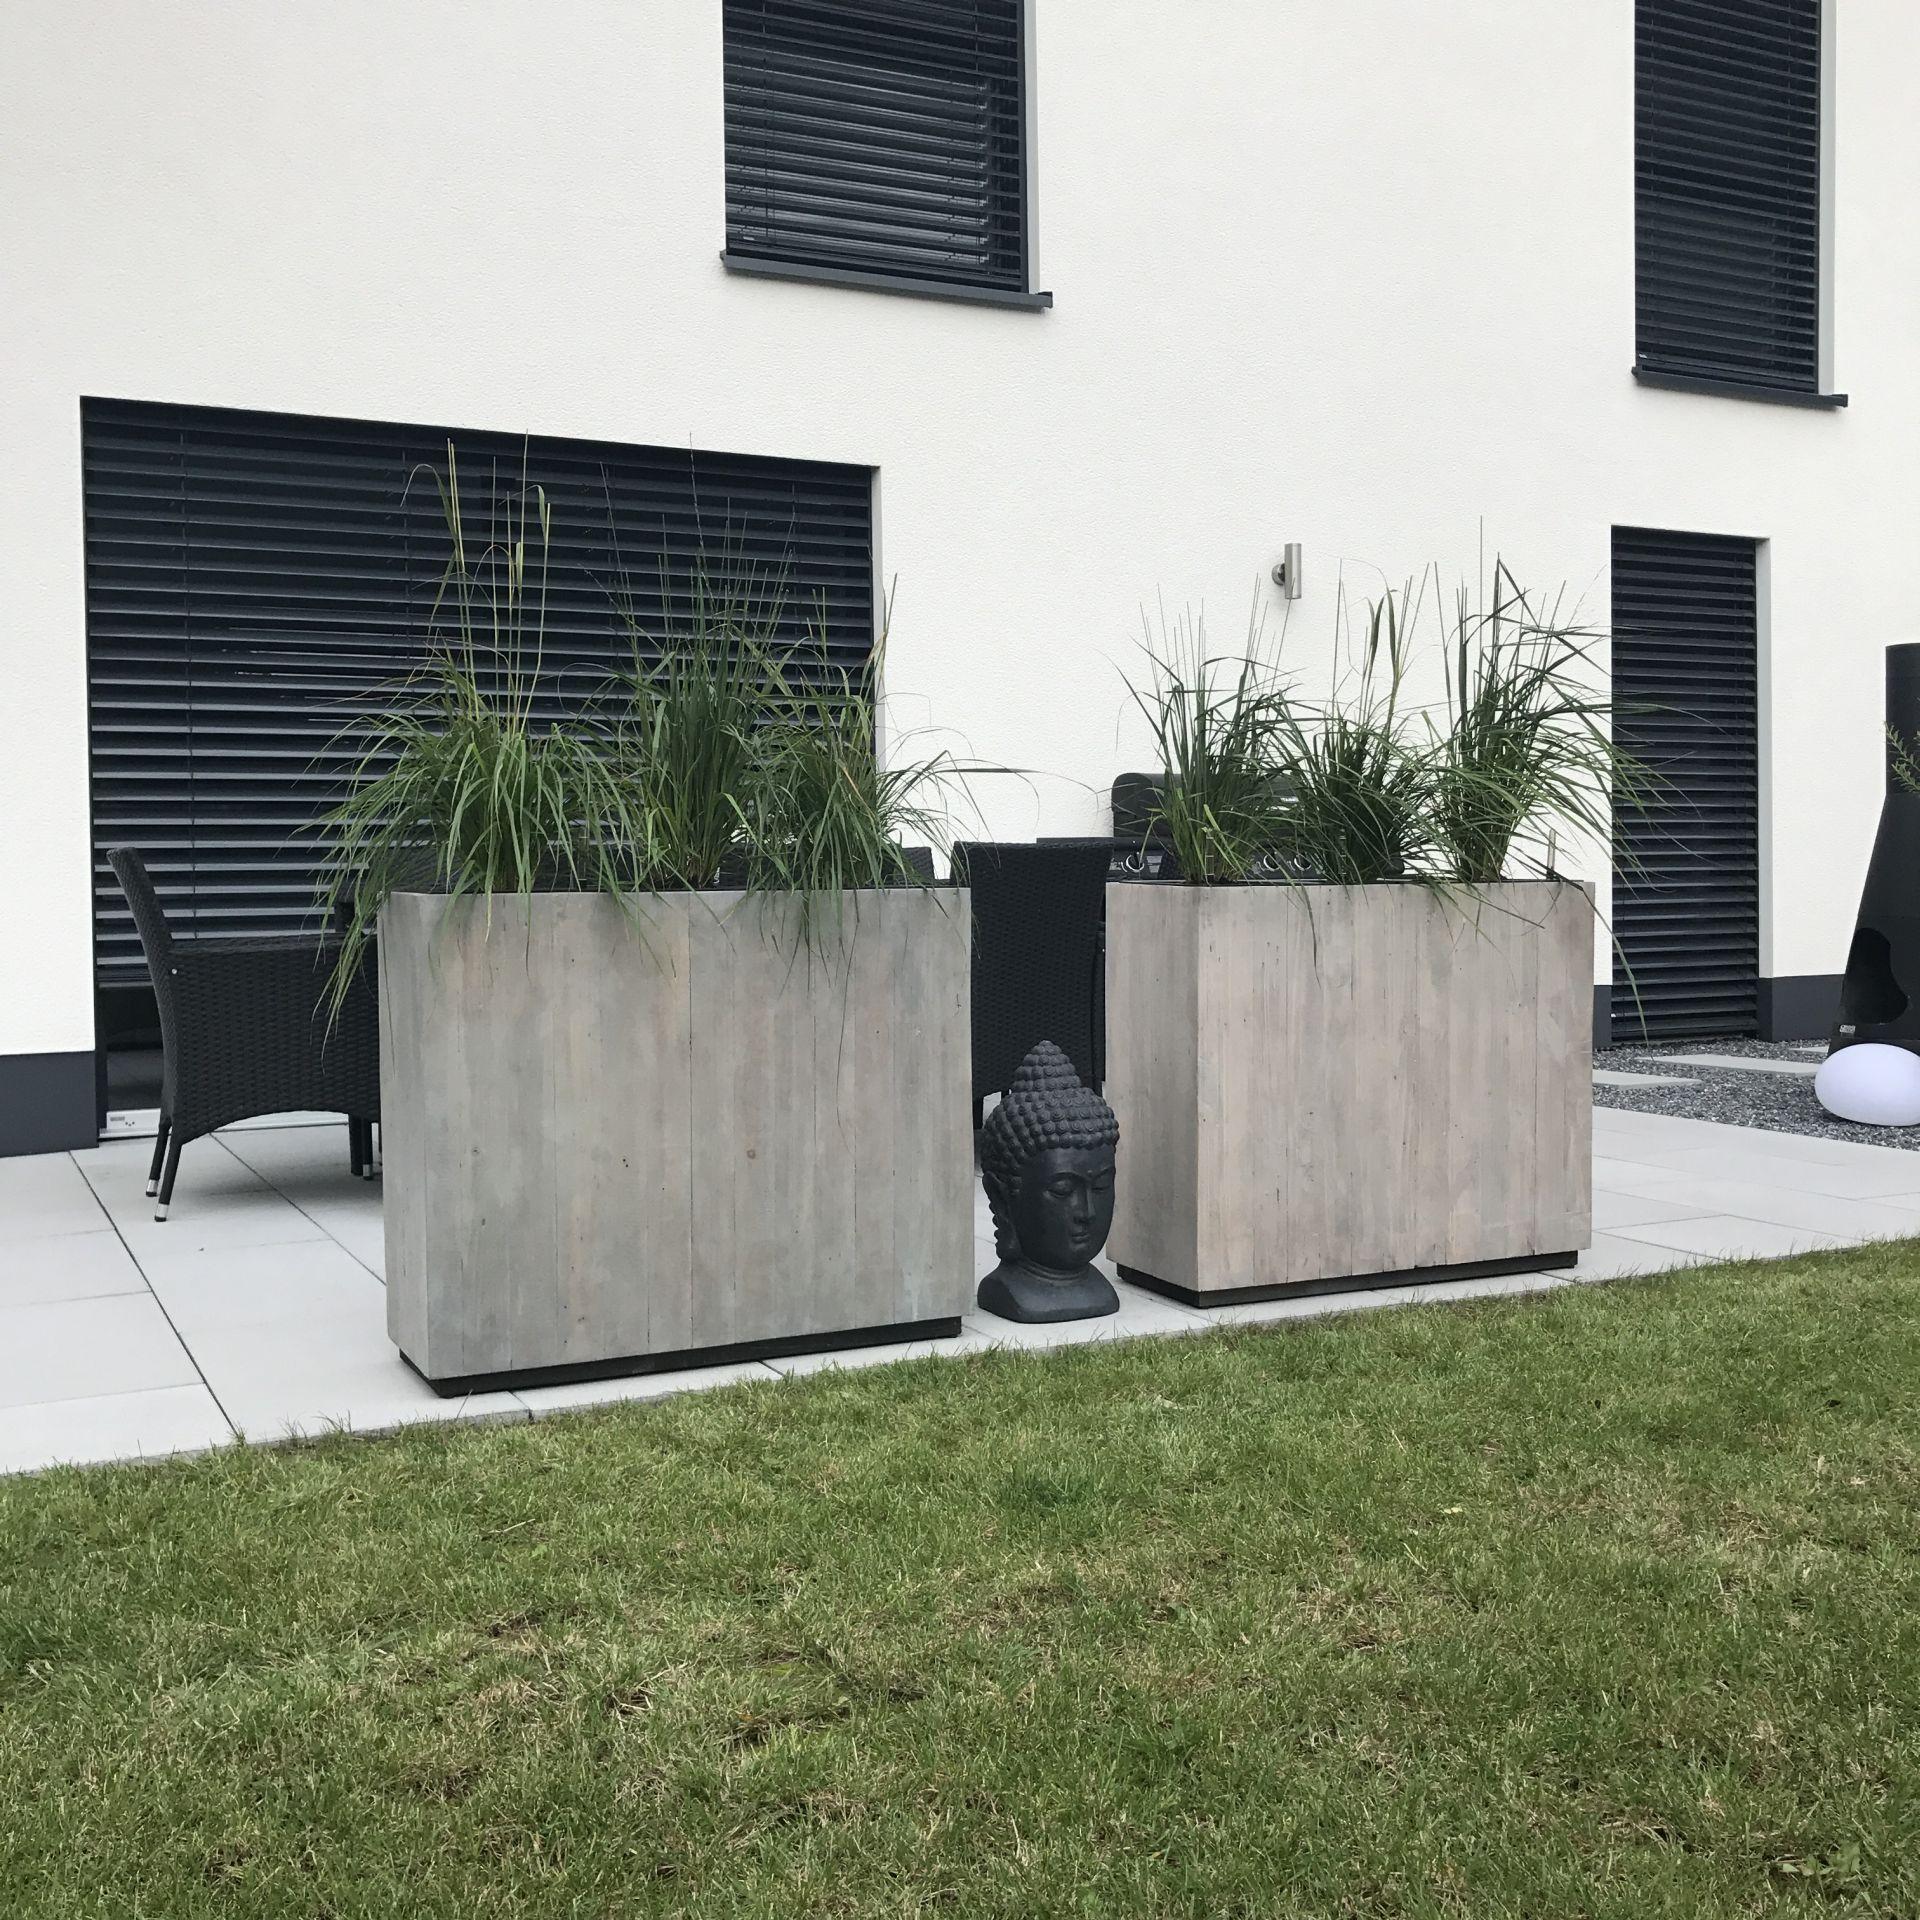 Pflanzkubel Raumteiler Recycling Holz Elemento Antik Weiss